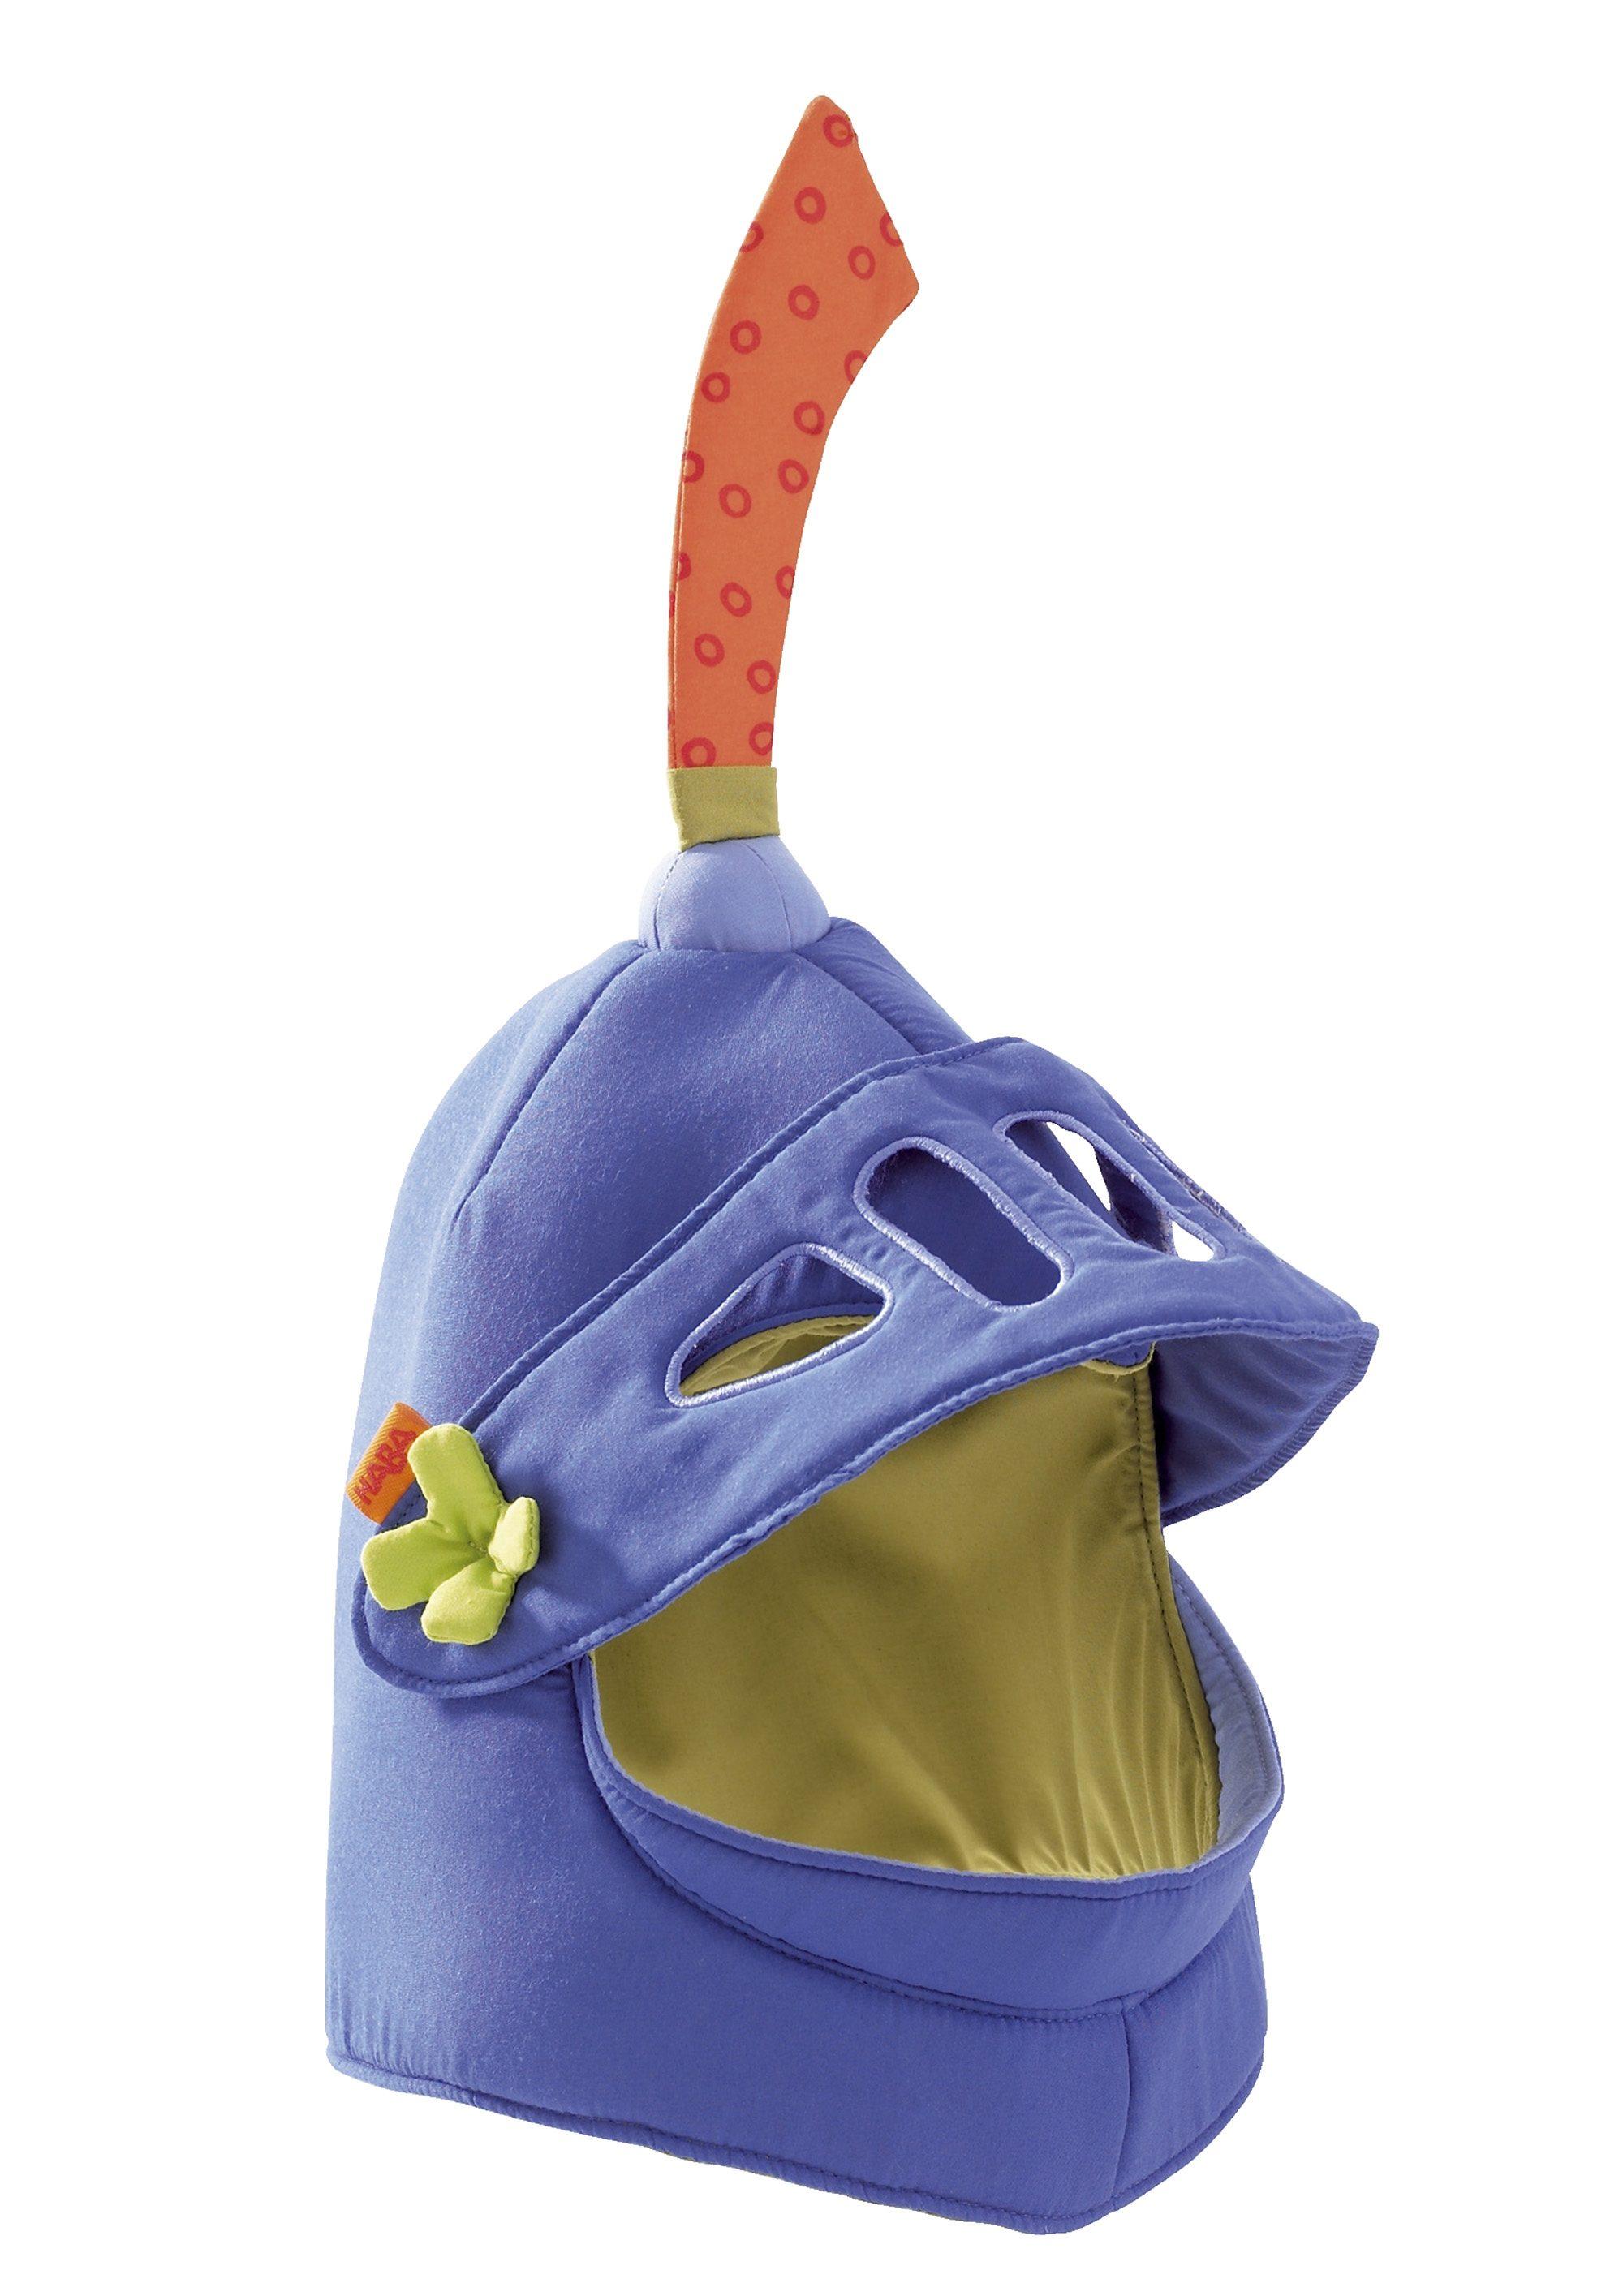 HABA® Kinder-Helm, »Henri Habastark«